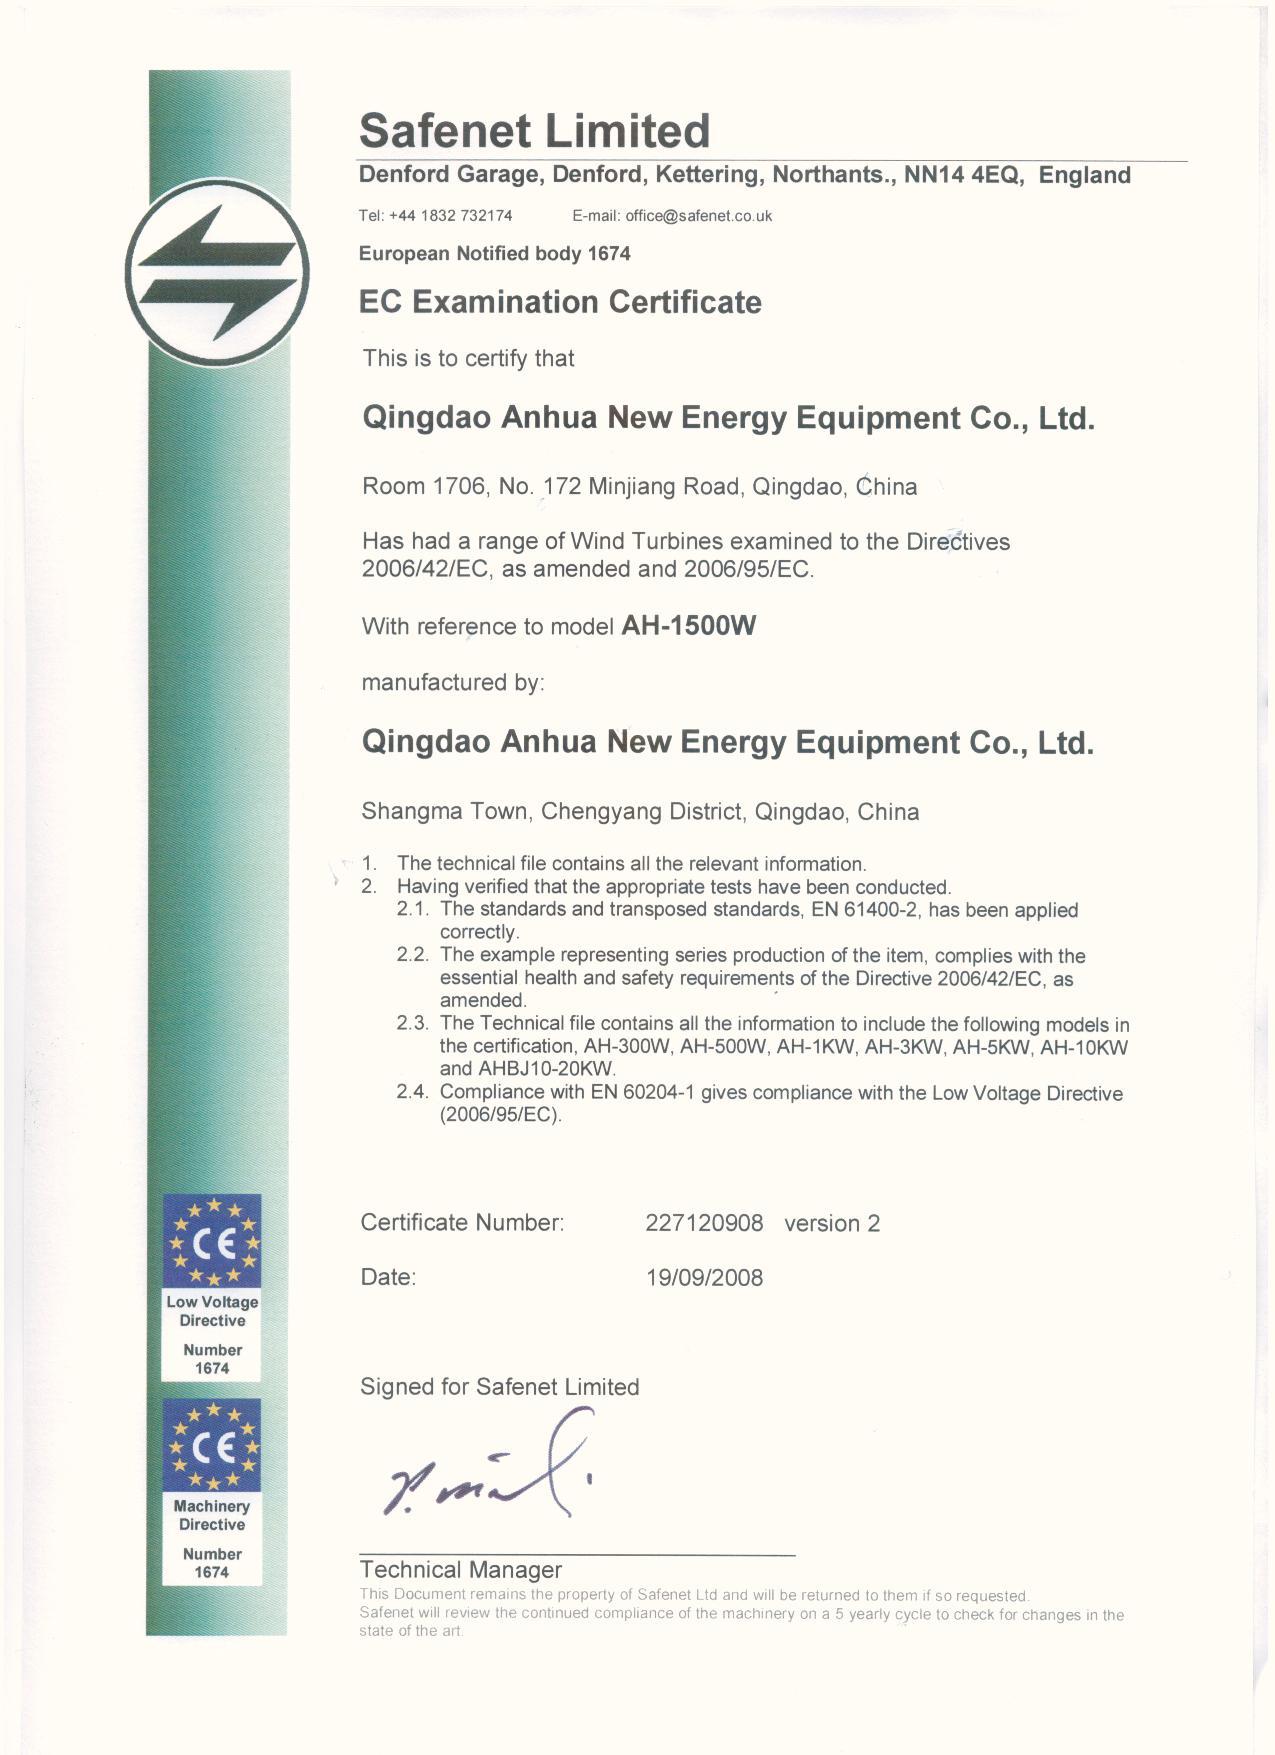 EN61400-2